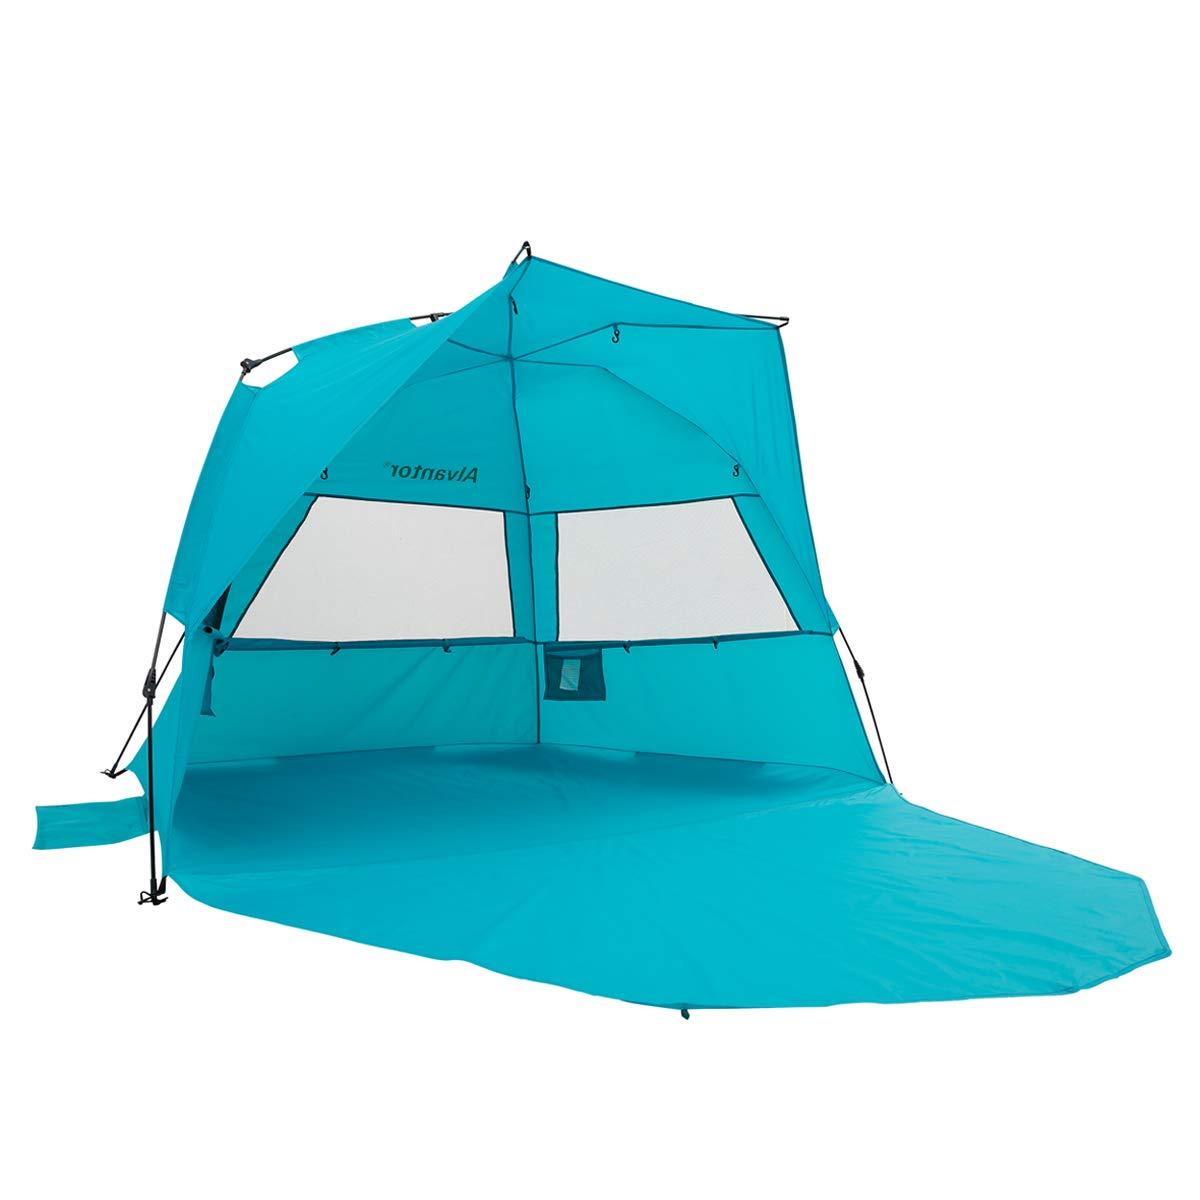 Alvantor Extra Large Beach Tent Super Bluecoast Beach Umbrella Outdoor Sun Shelter Cabana Automatic Pop Up UPF 50+ Sun Shade Portable Camping Fishing Hiking Canopy Easy Setup Windproof Patent Pending by Alvantor